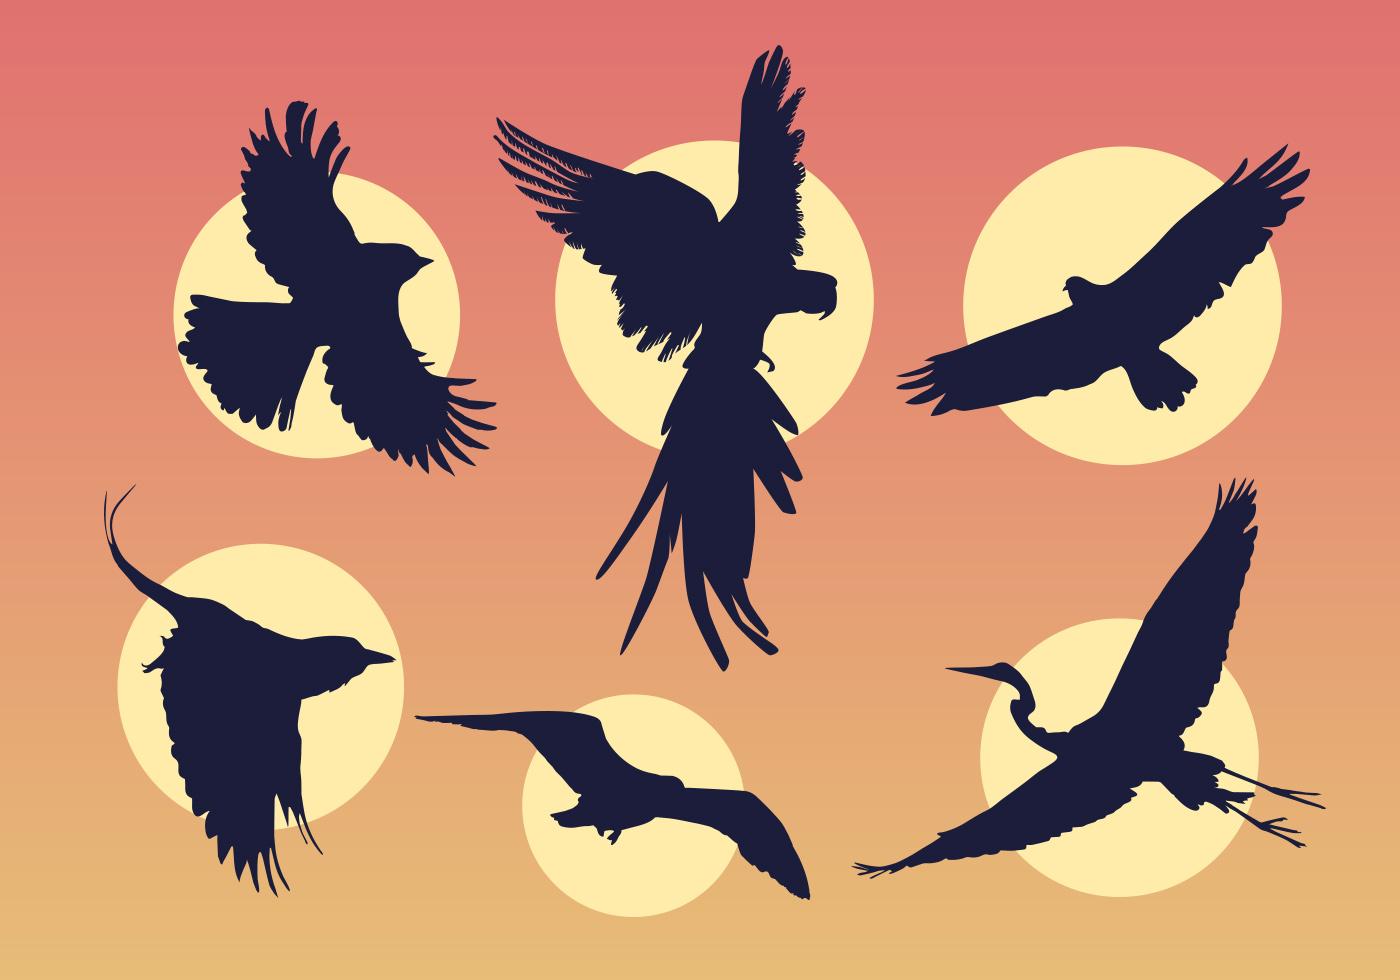 Flying birds - Download Free Vector Art, Stock Graphics ... - photo#10